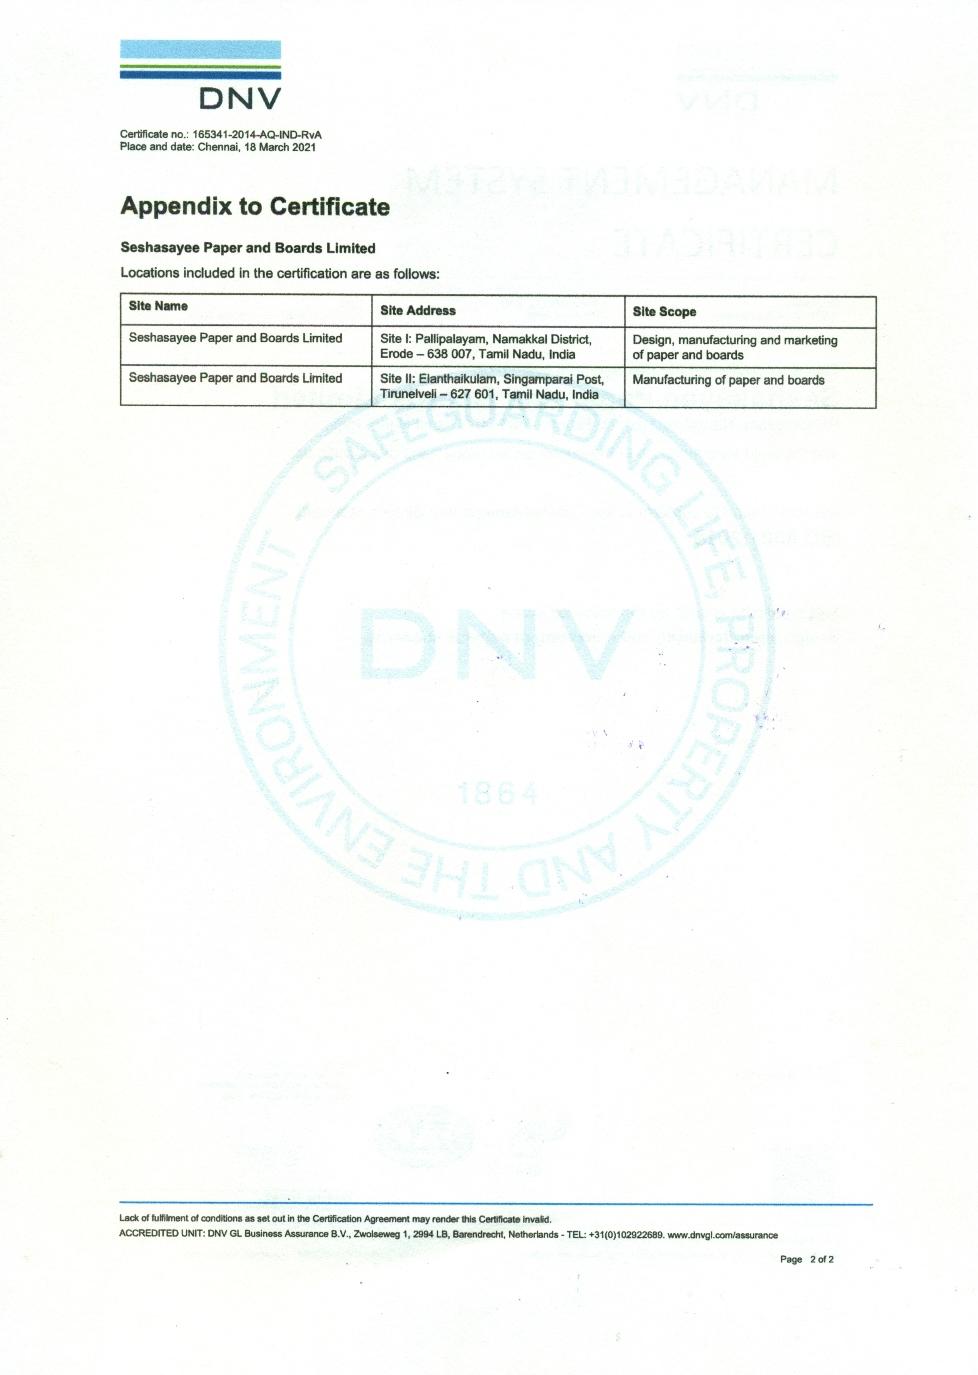 QMS - ISO 9001:2008